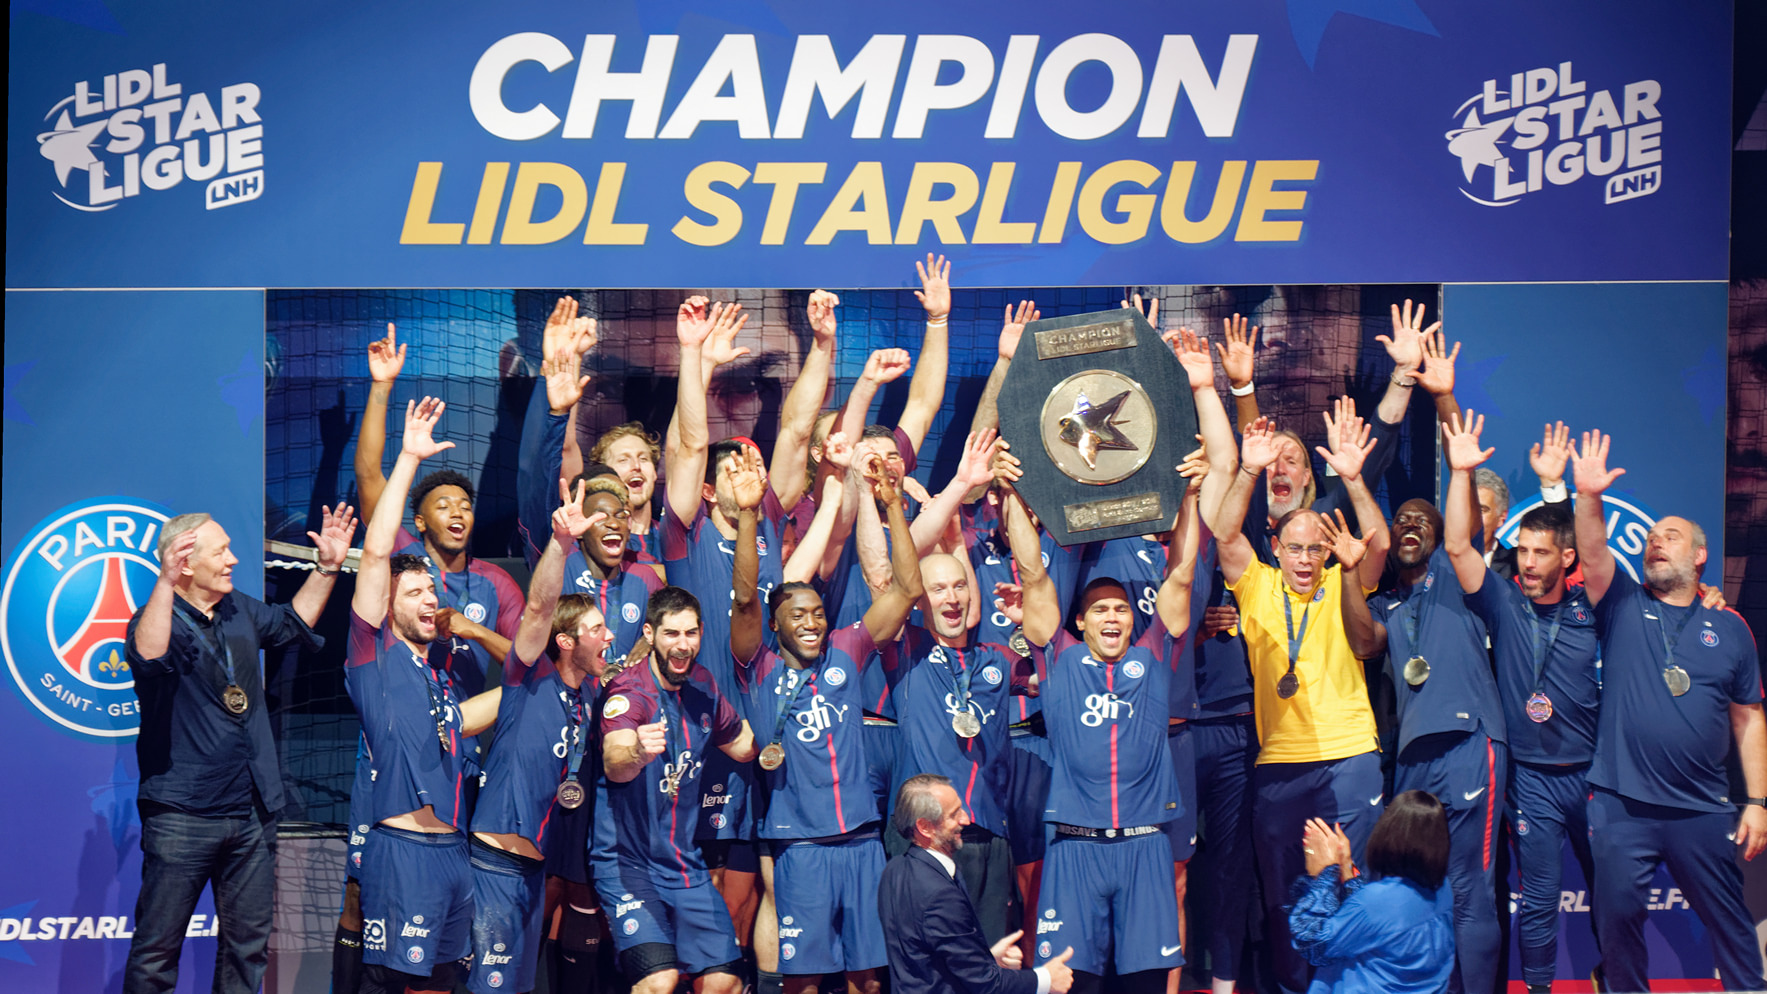 Lidl Starligue Calendrier.Championnat De France Masculin De Handball 2017 2018 Wikipedia